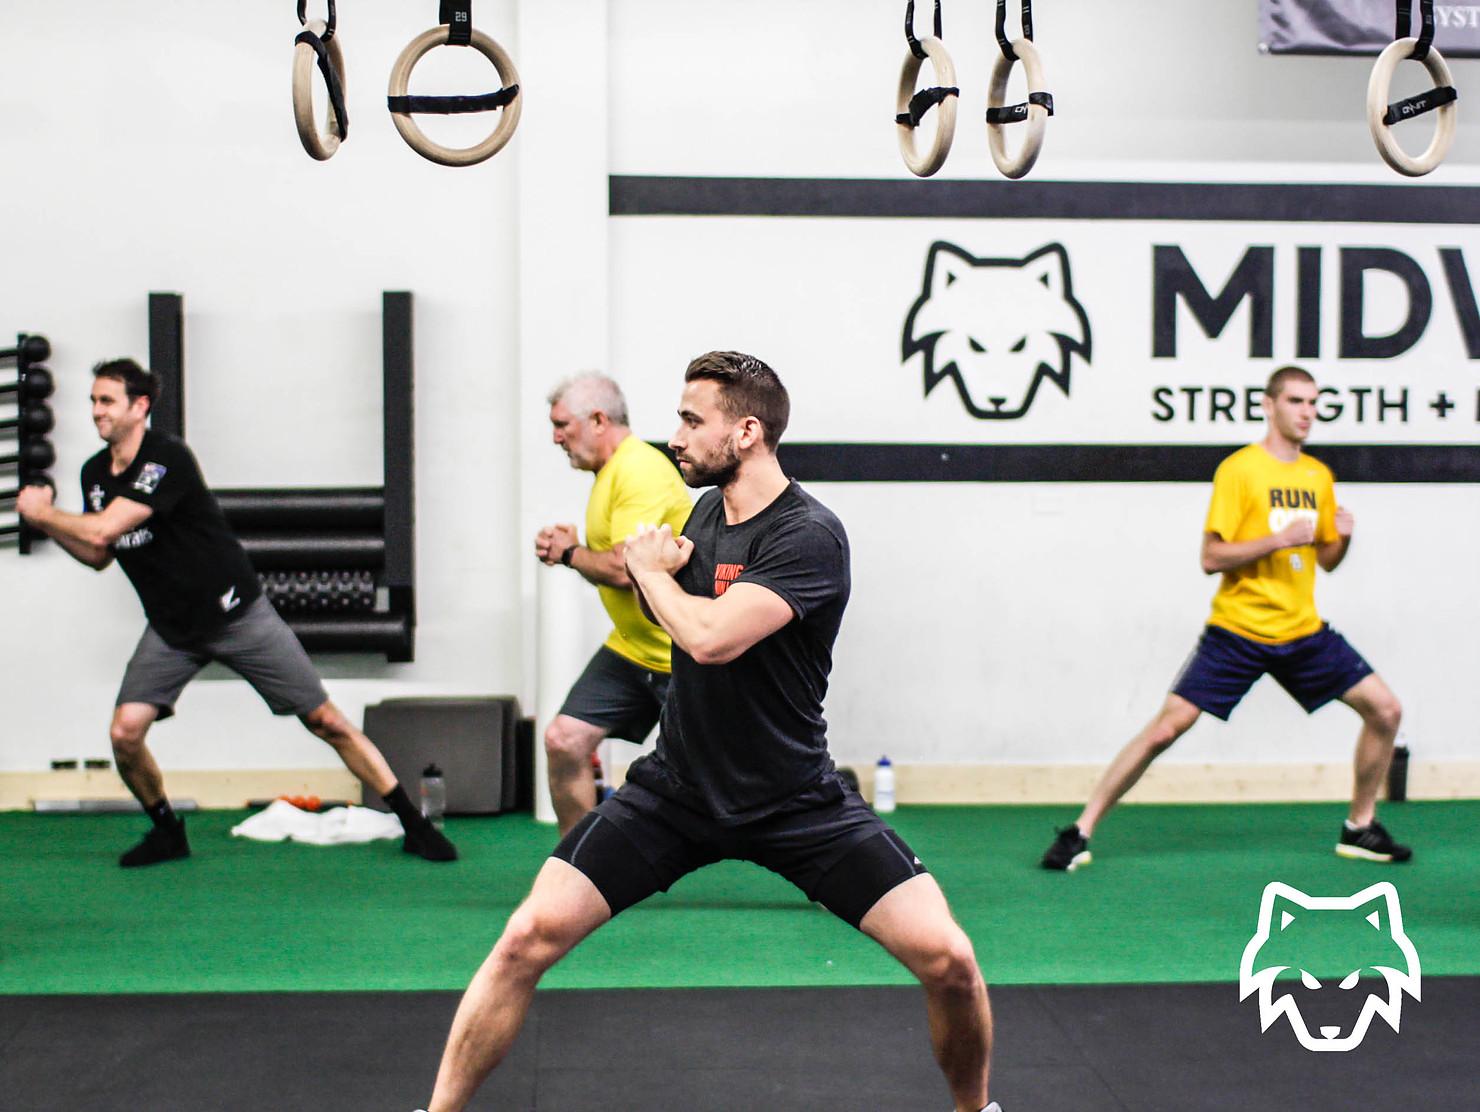 Coach Zane Roebuck's bodyweight class near Wheaton Illinois at Midwest Strength + Performance gym